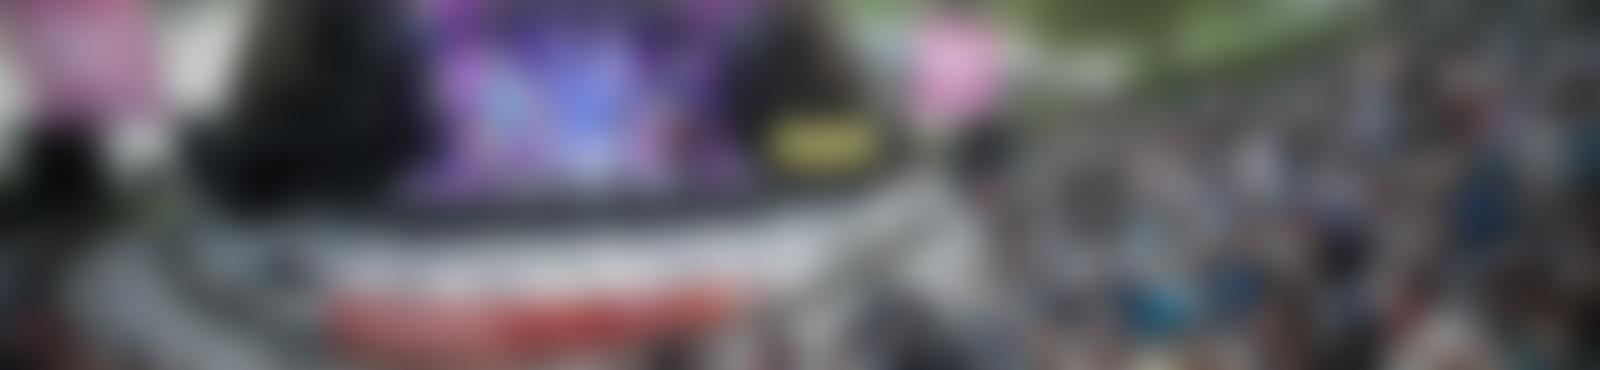 Blurred d7f9d27f 894e 41c2 8598 153f2e53b63d